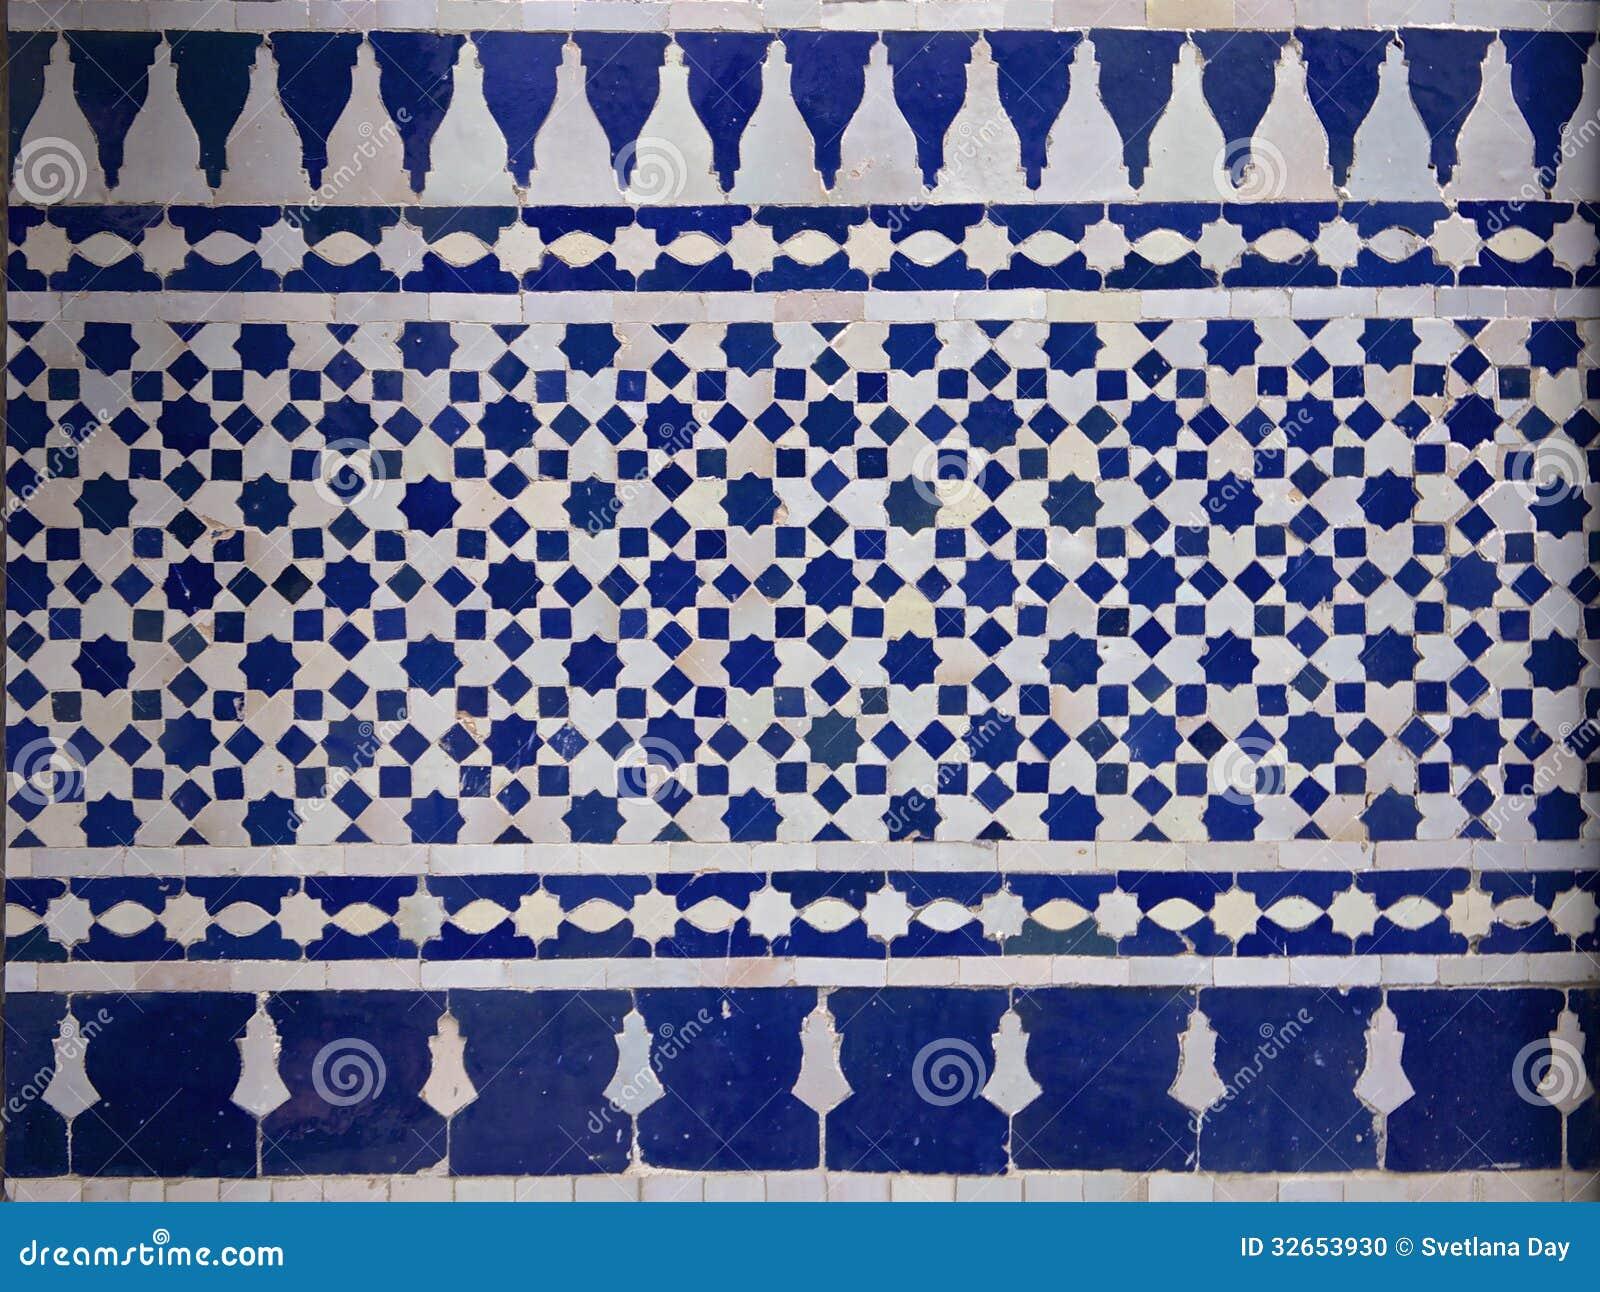 Moroccan zellige tile pattern stock photo image 32653930 for Fez tiles